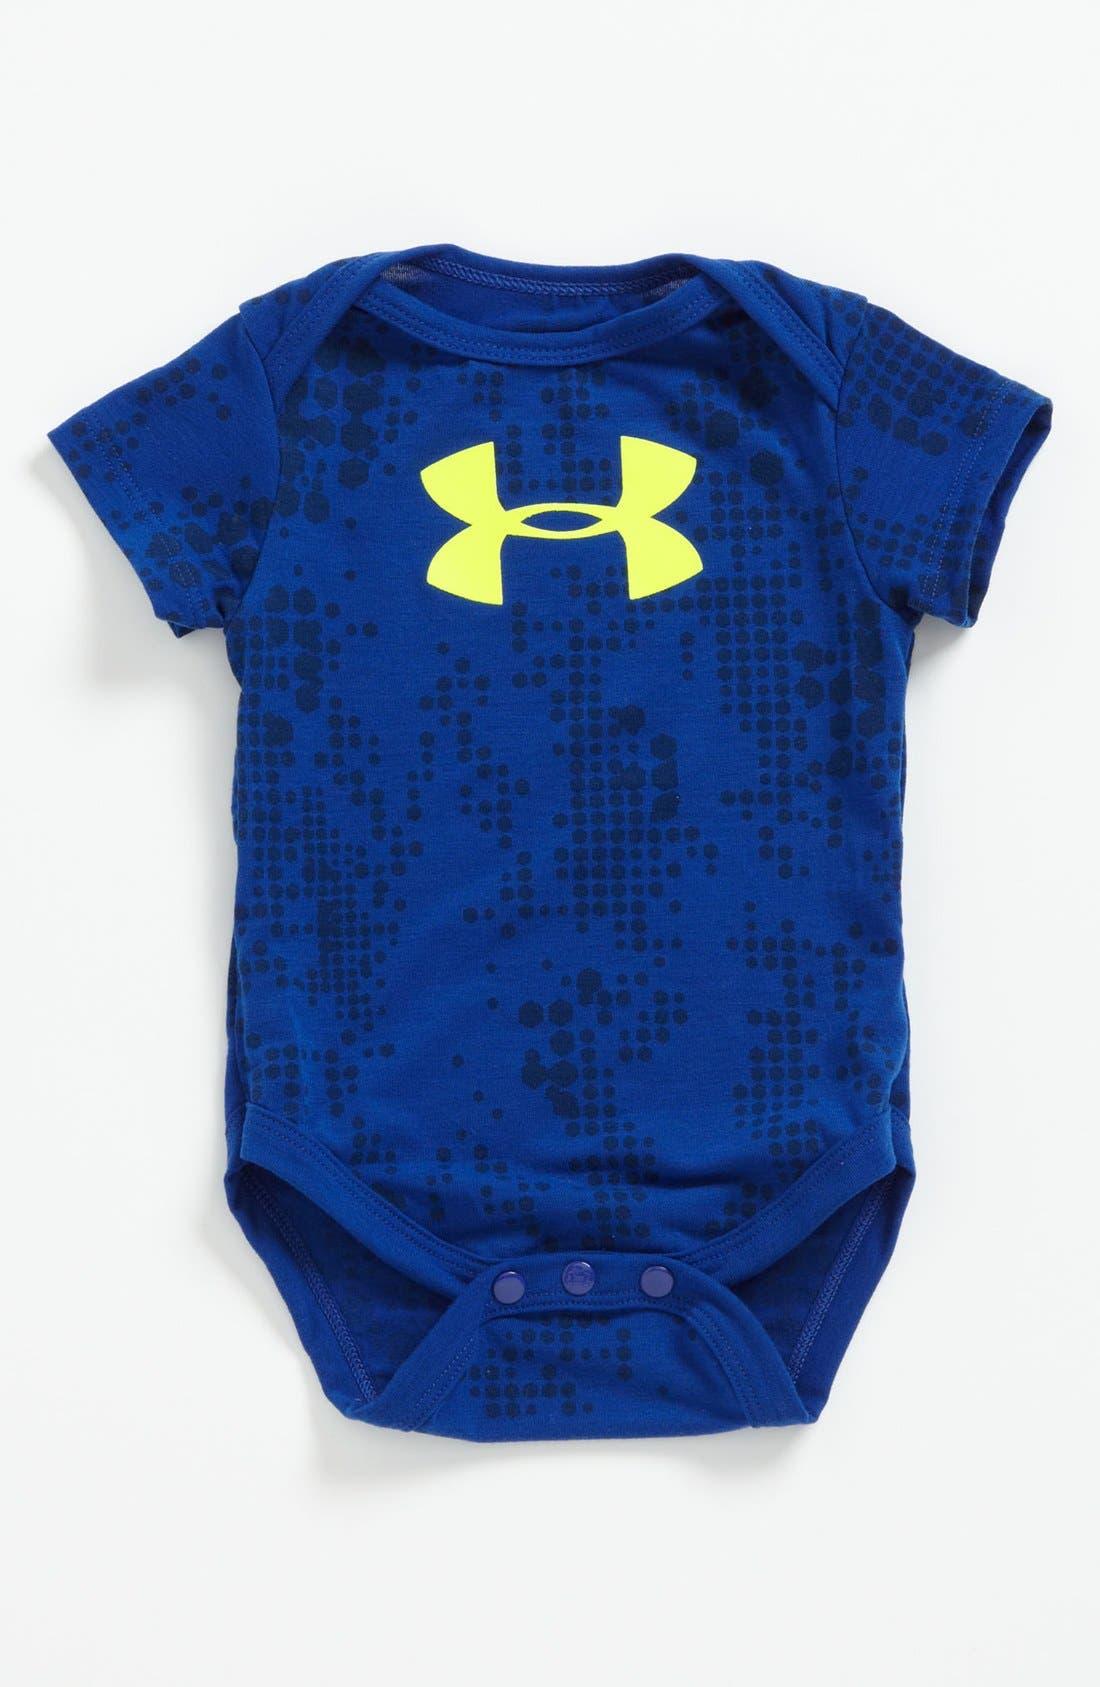 Main Image - Under Armour 'Camo Frog' Bodysuit (Baby)